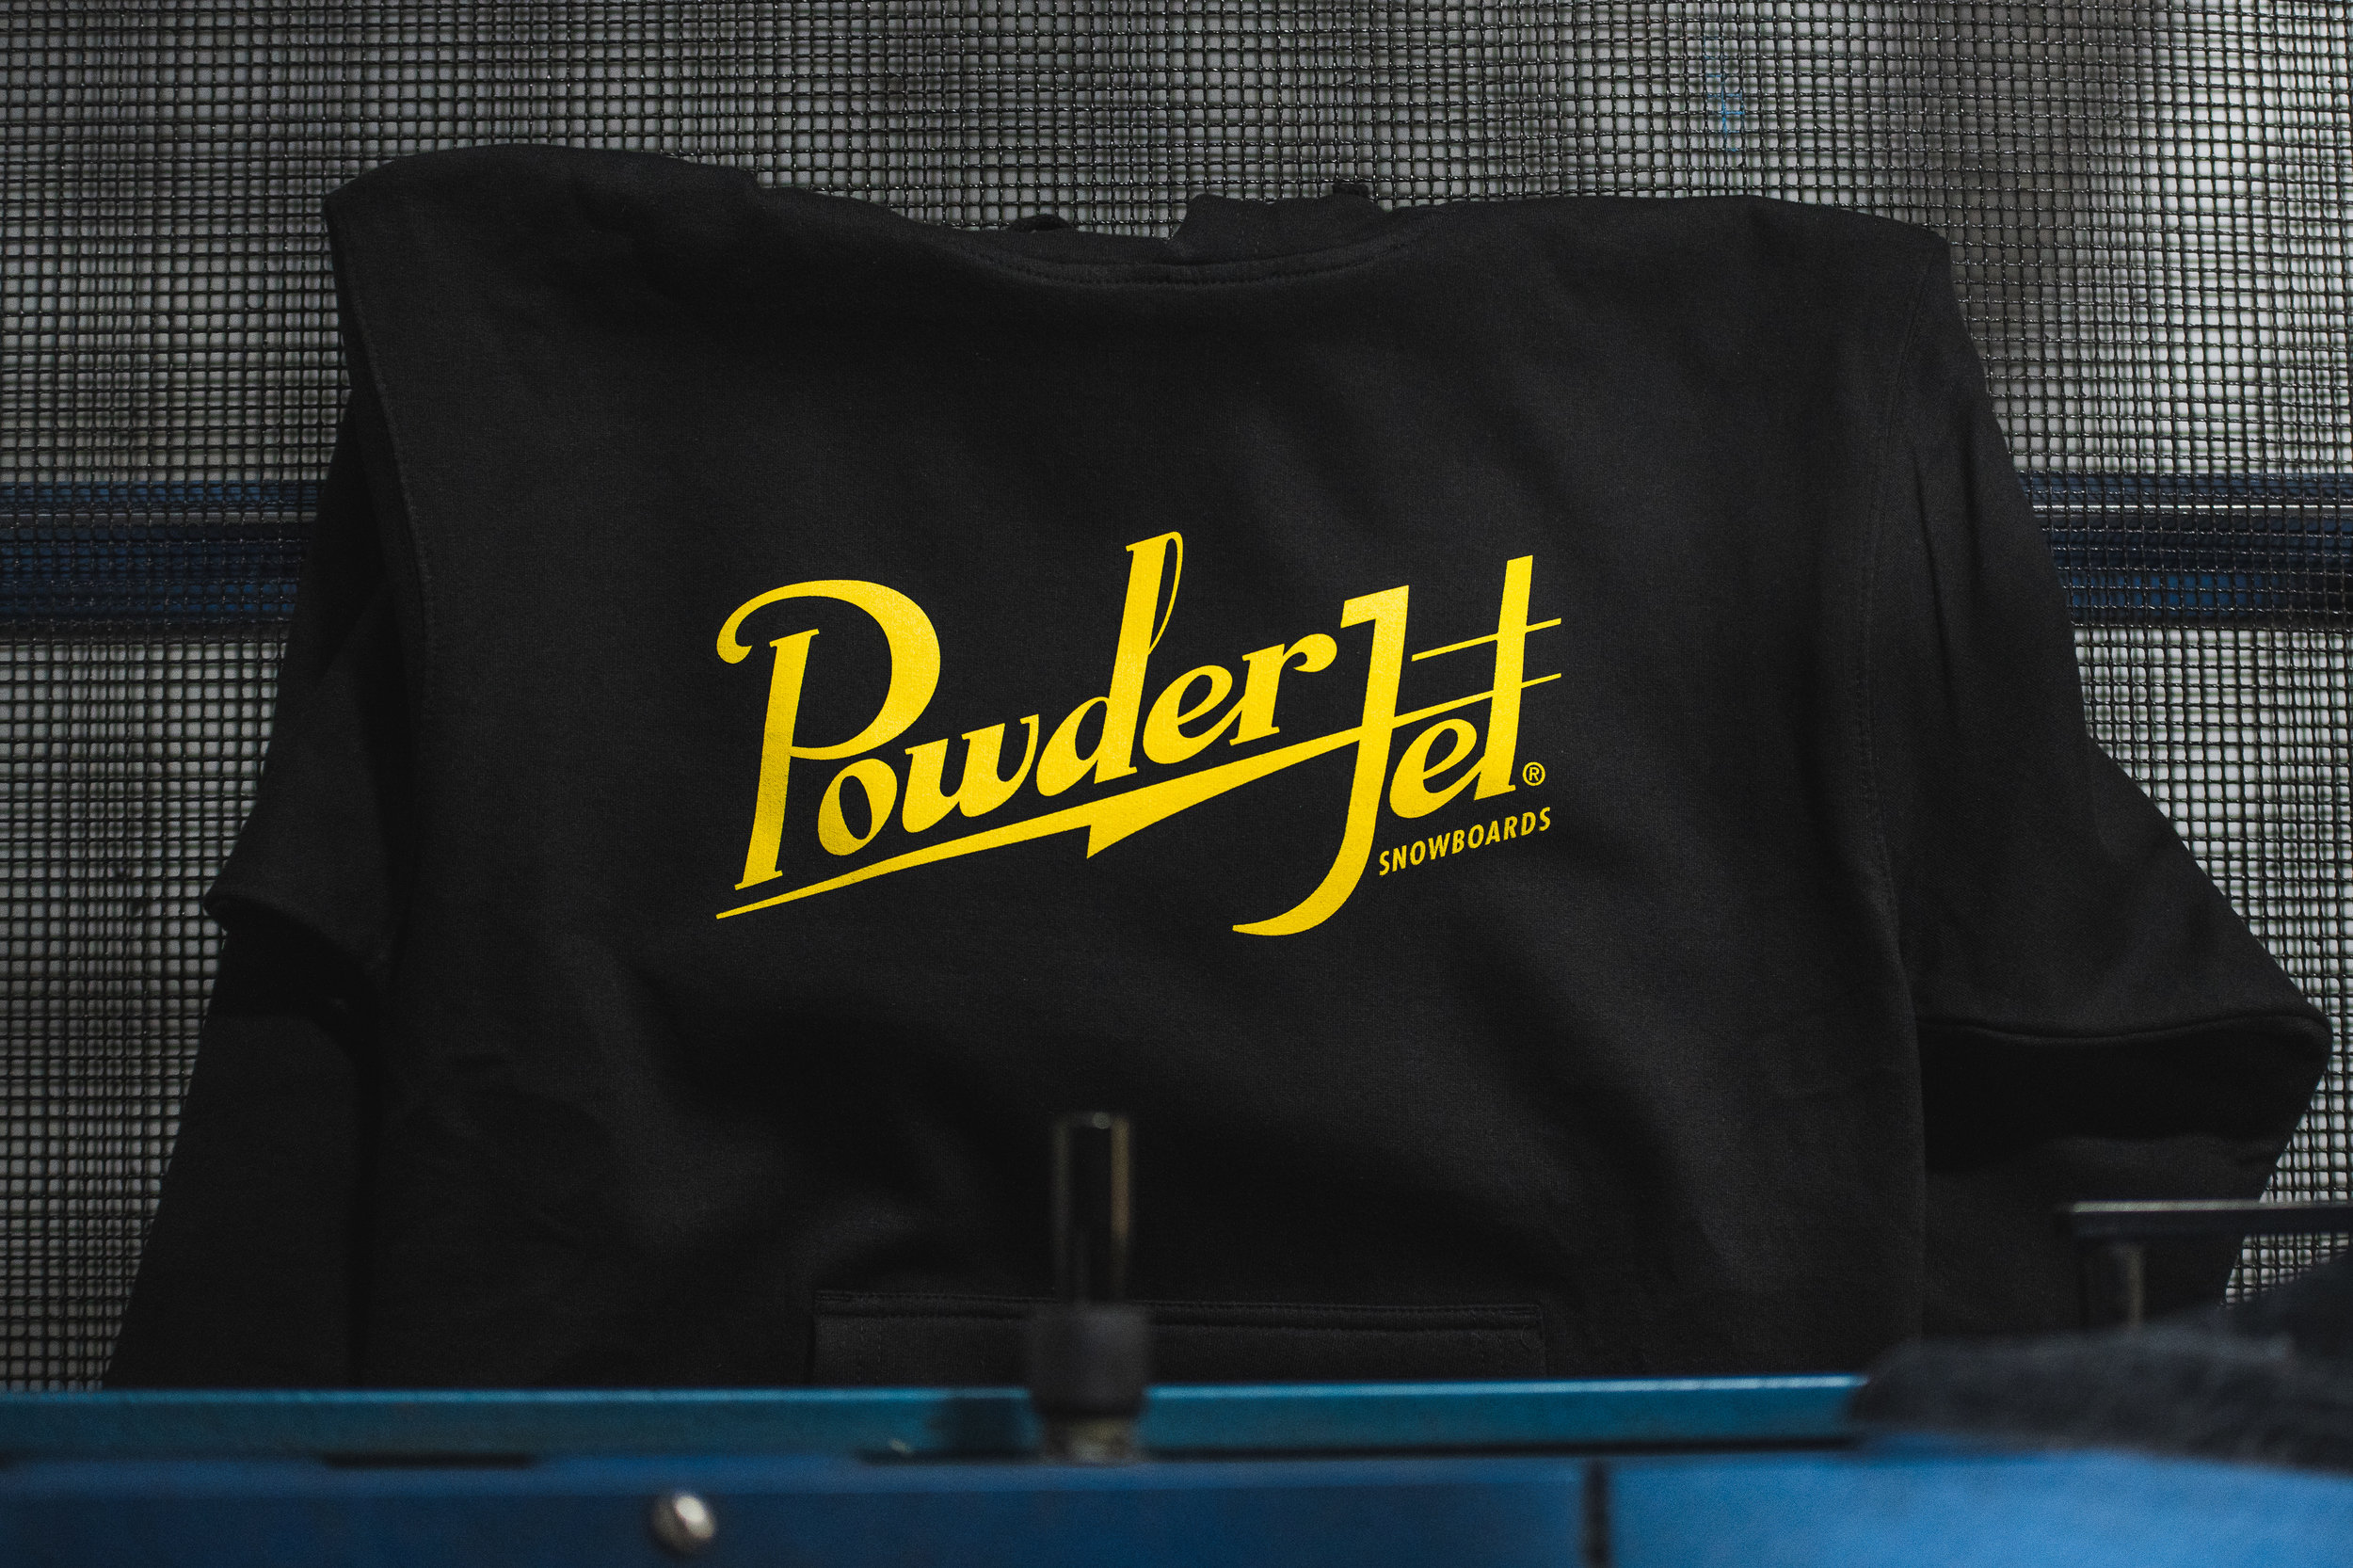 1 Color print for PowderJet Snowboards